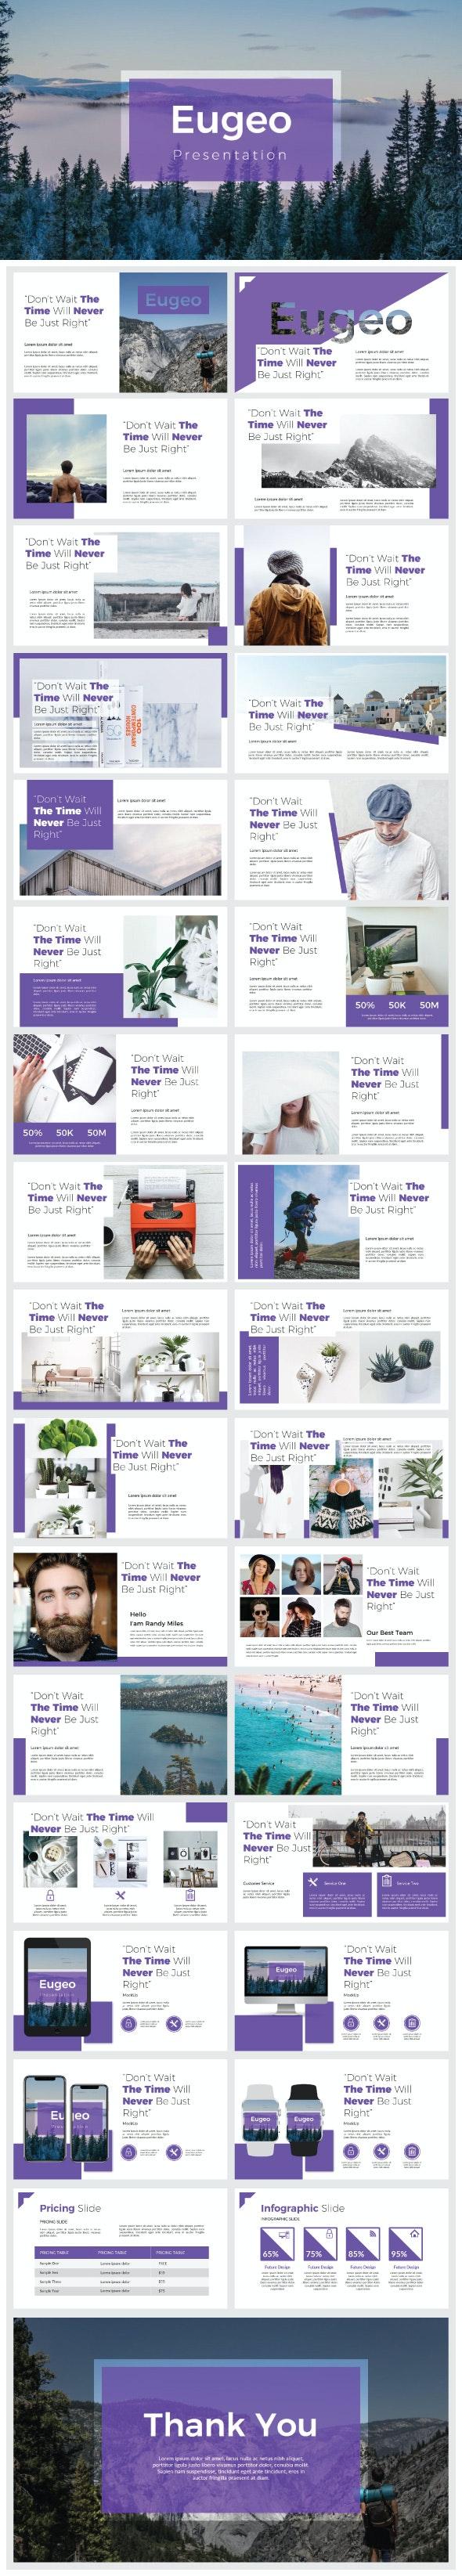 Eugeo - Presentation Templates - Creative PowerPoint Templates